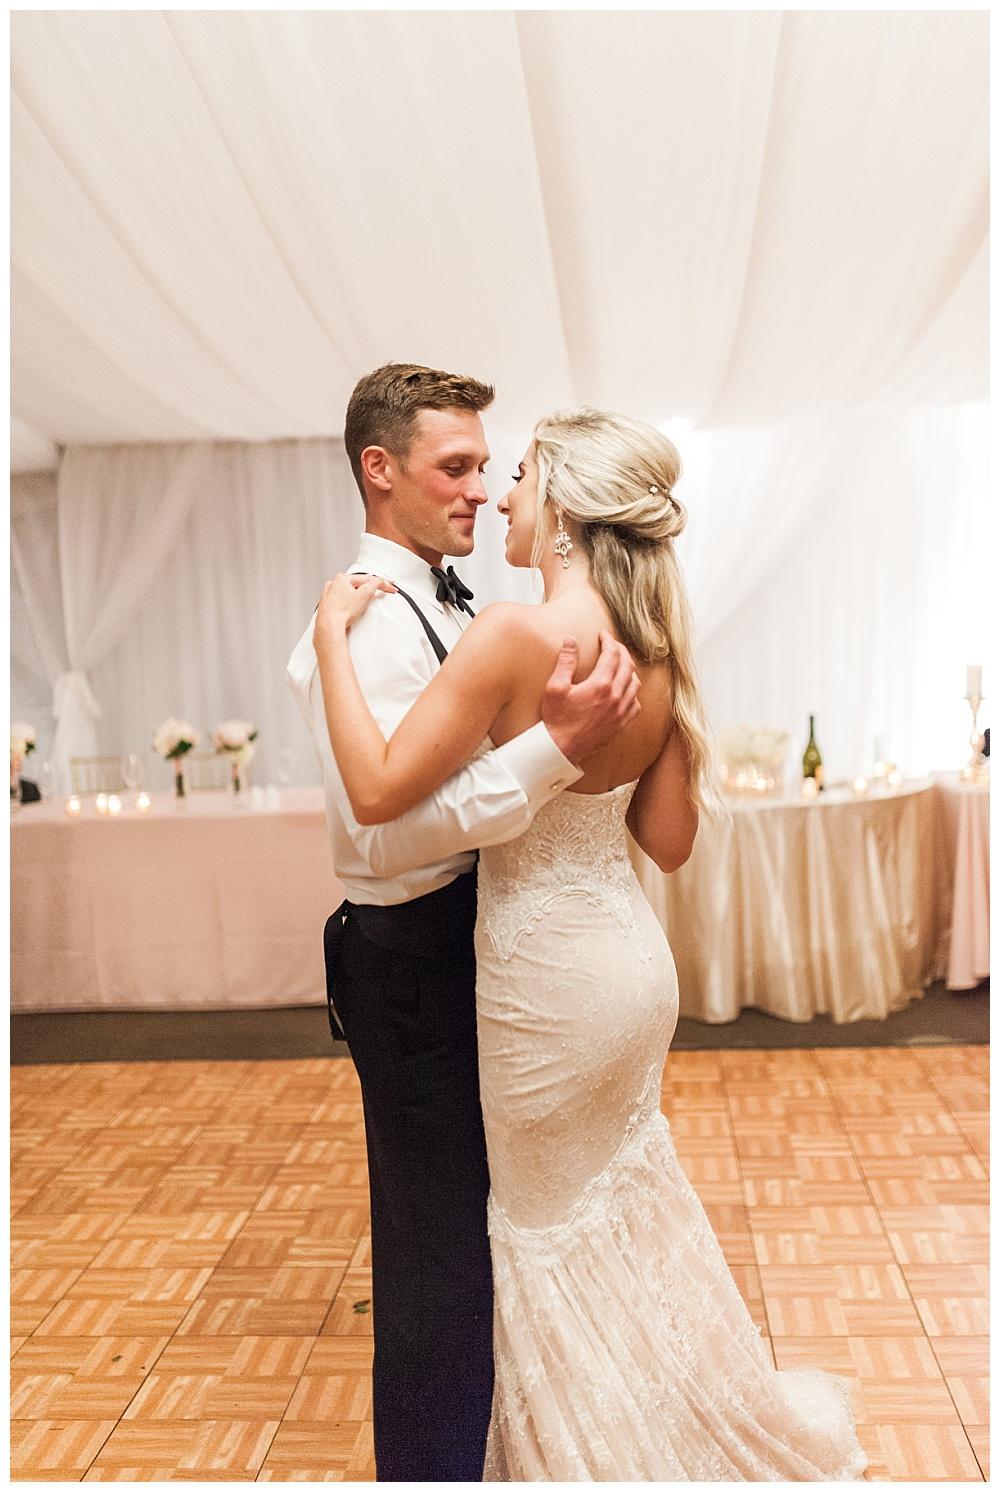 Stephanie Marie Photography TPC Deere Run Quad Cities Iowa City Wedding Photographer Ben Erin Dittmer_0089.jpg